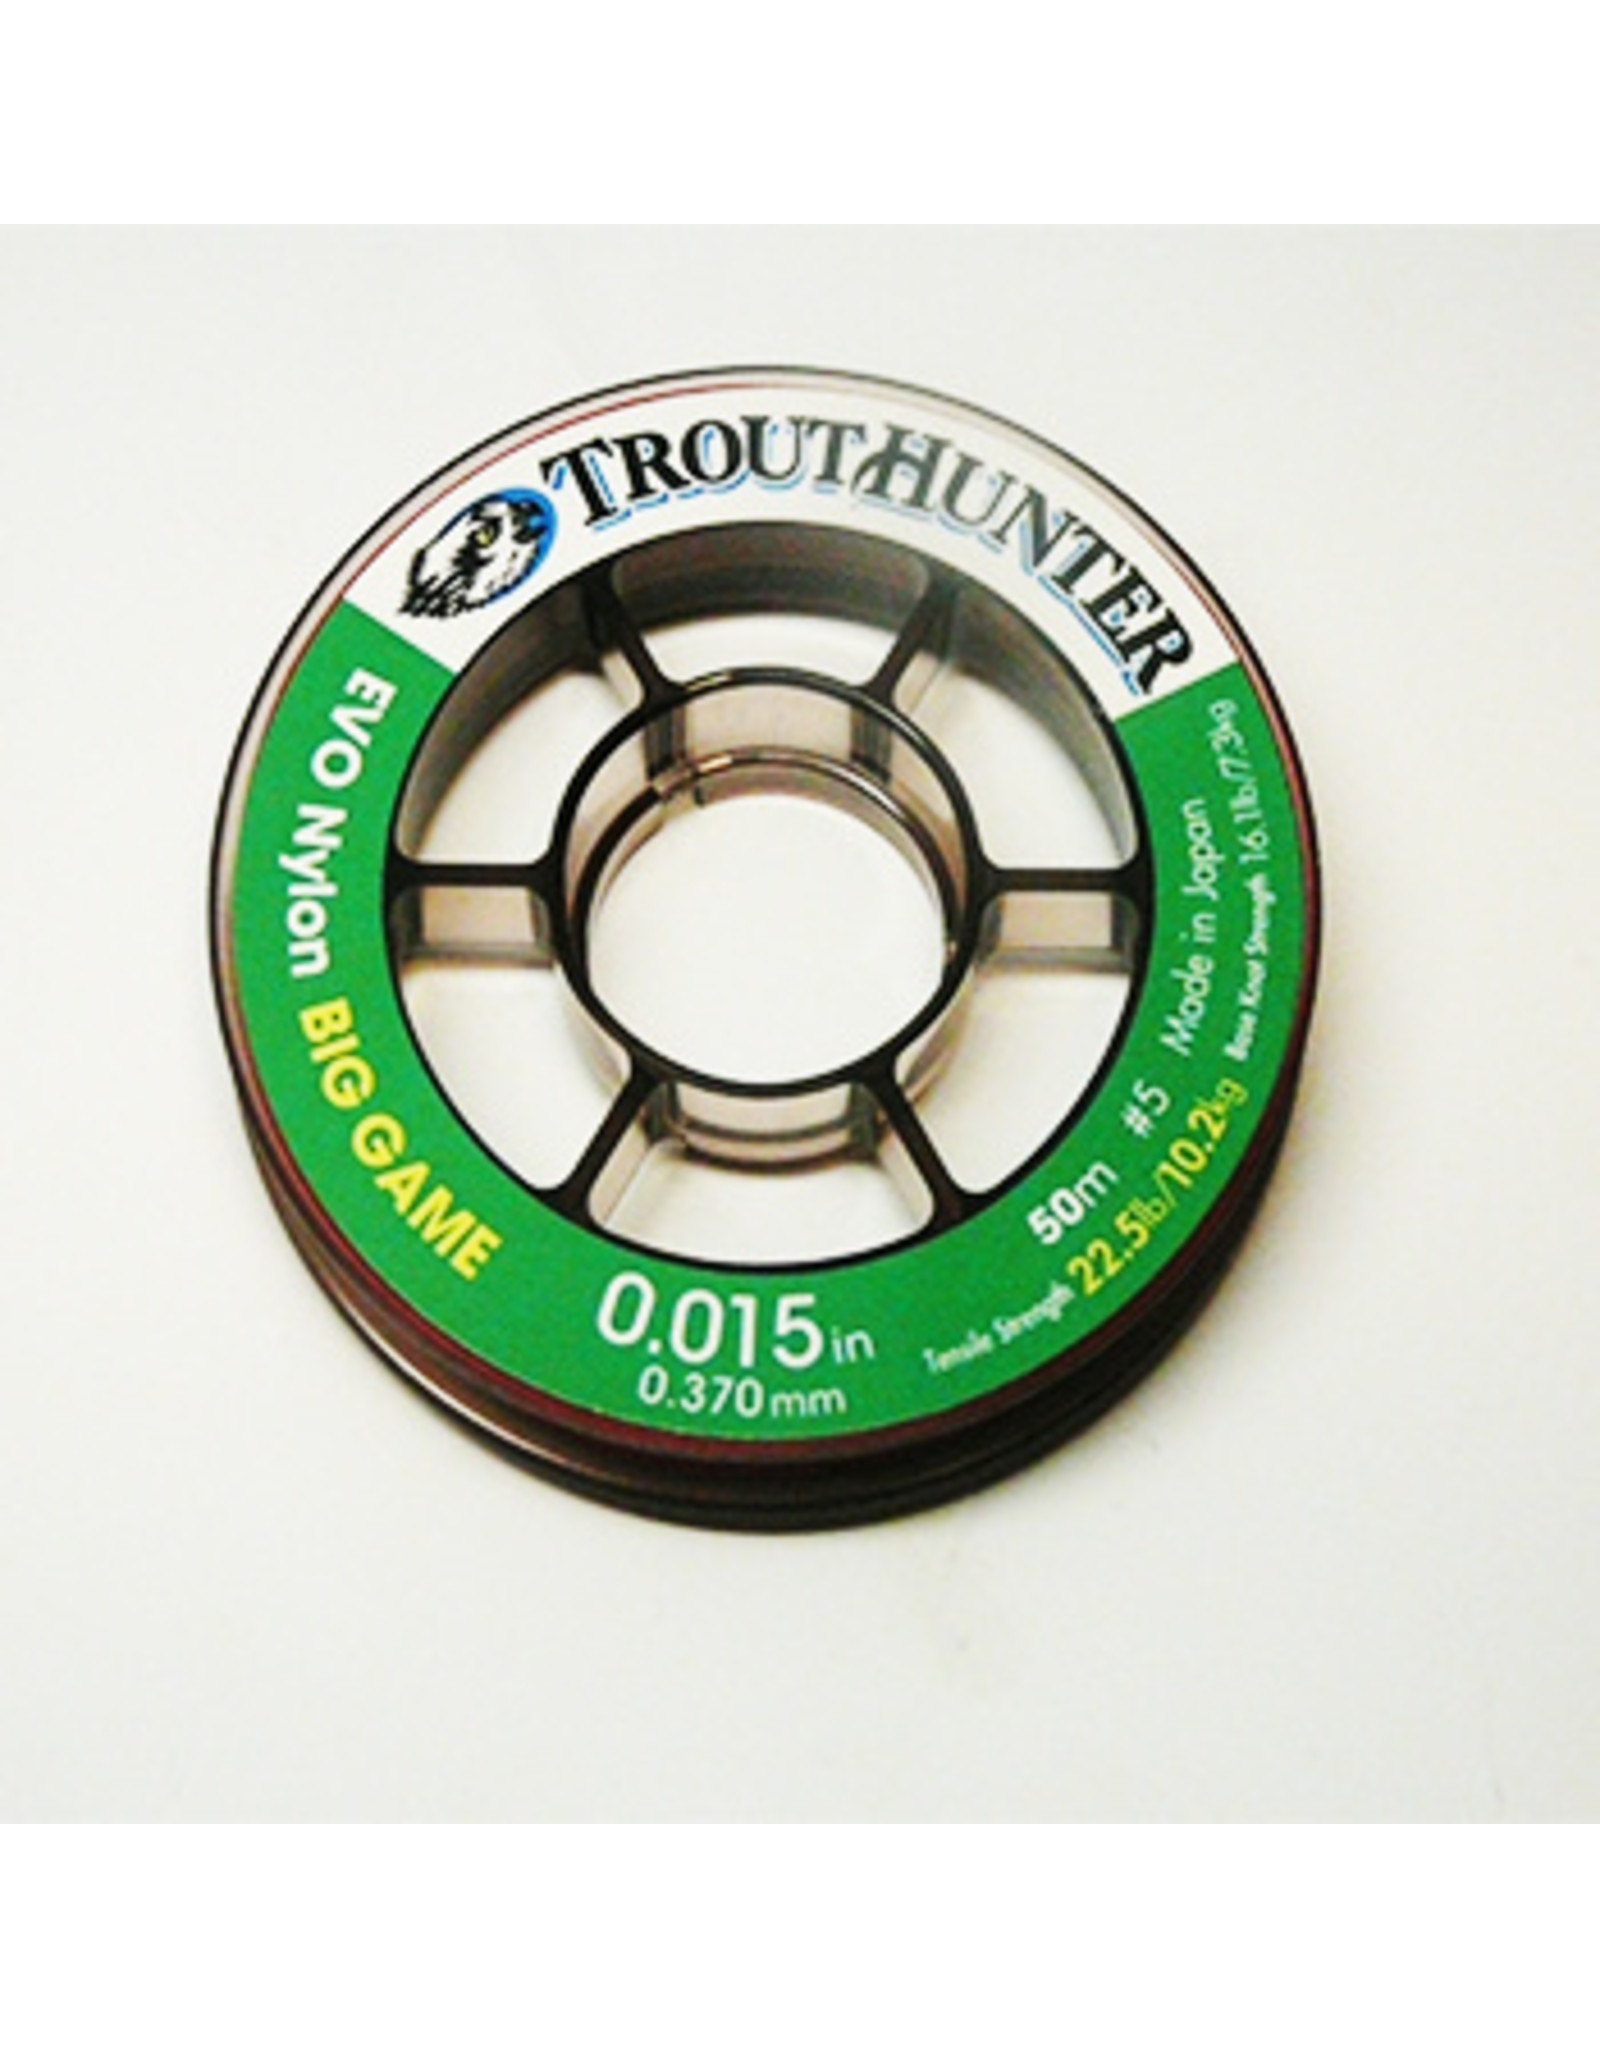 Trouthunter Trouthunter EVO Nylon Big Game Leader Material .010 (1X) - 12.1lb 50m